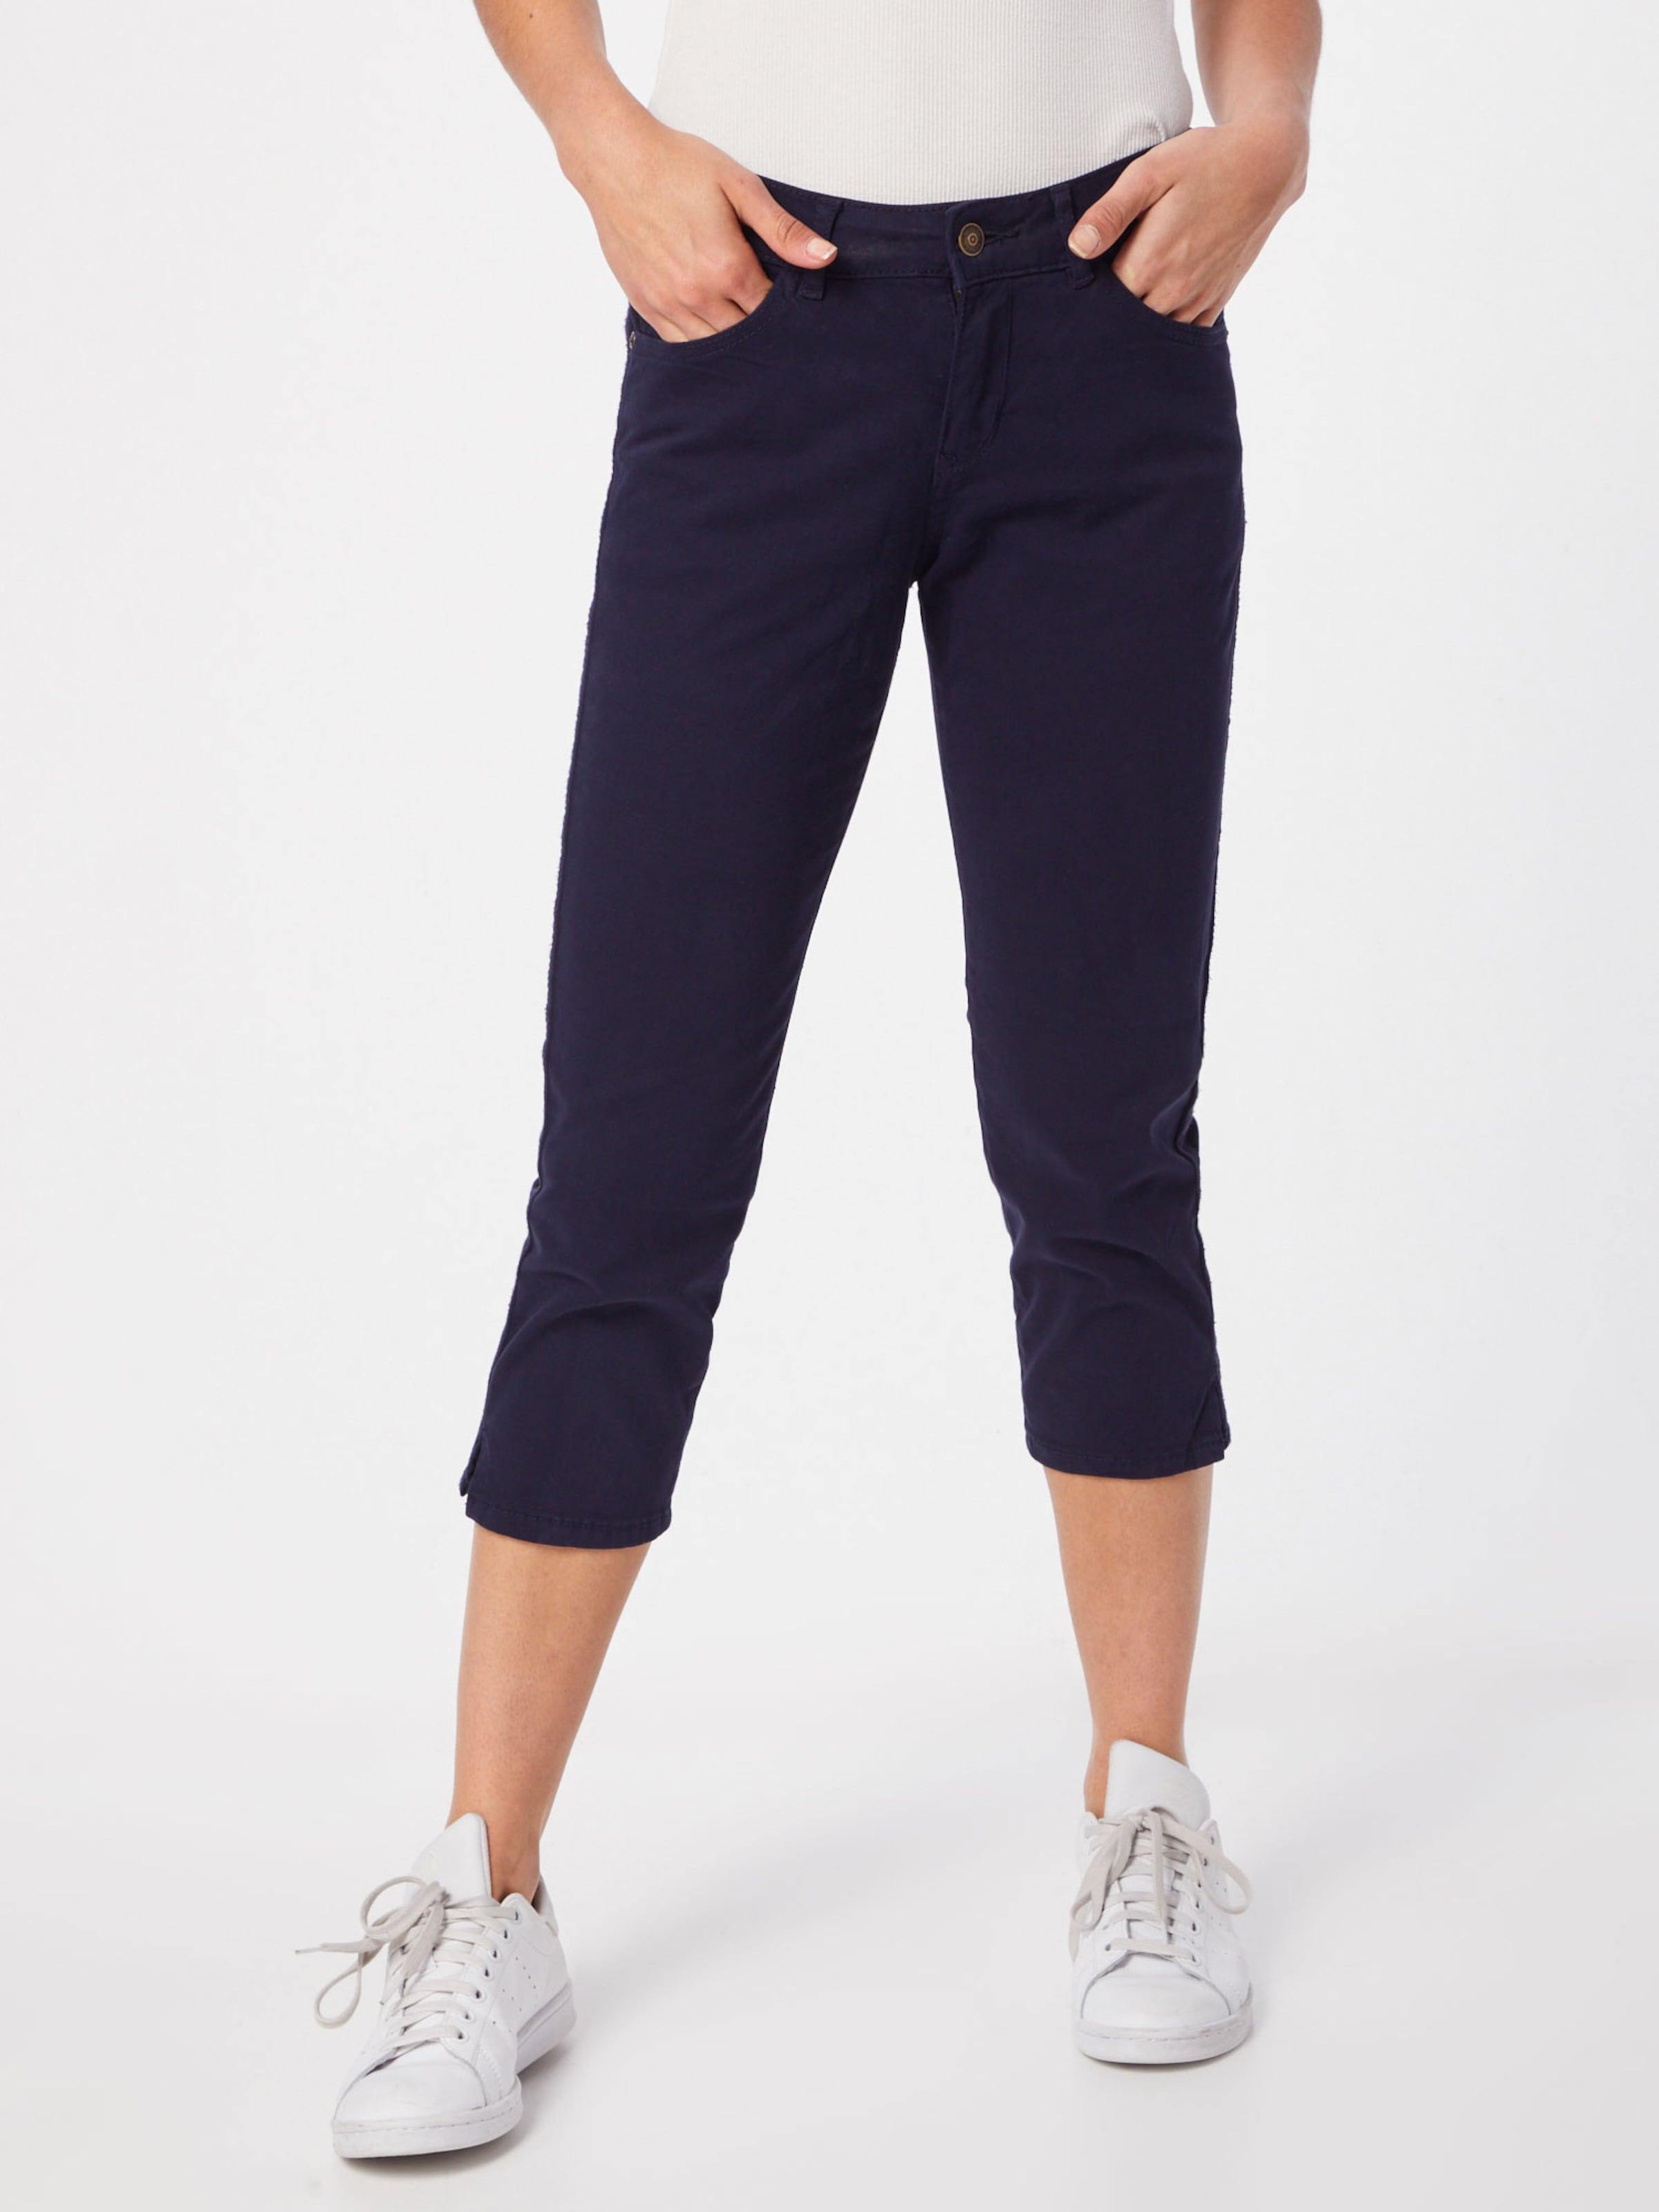 Label oliver Pantalon S Red En Bleu Foncé 354AjLRq